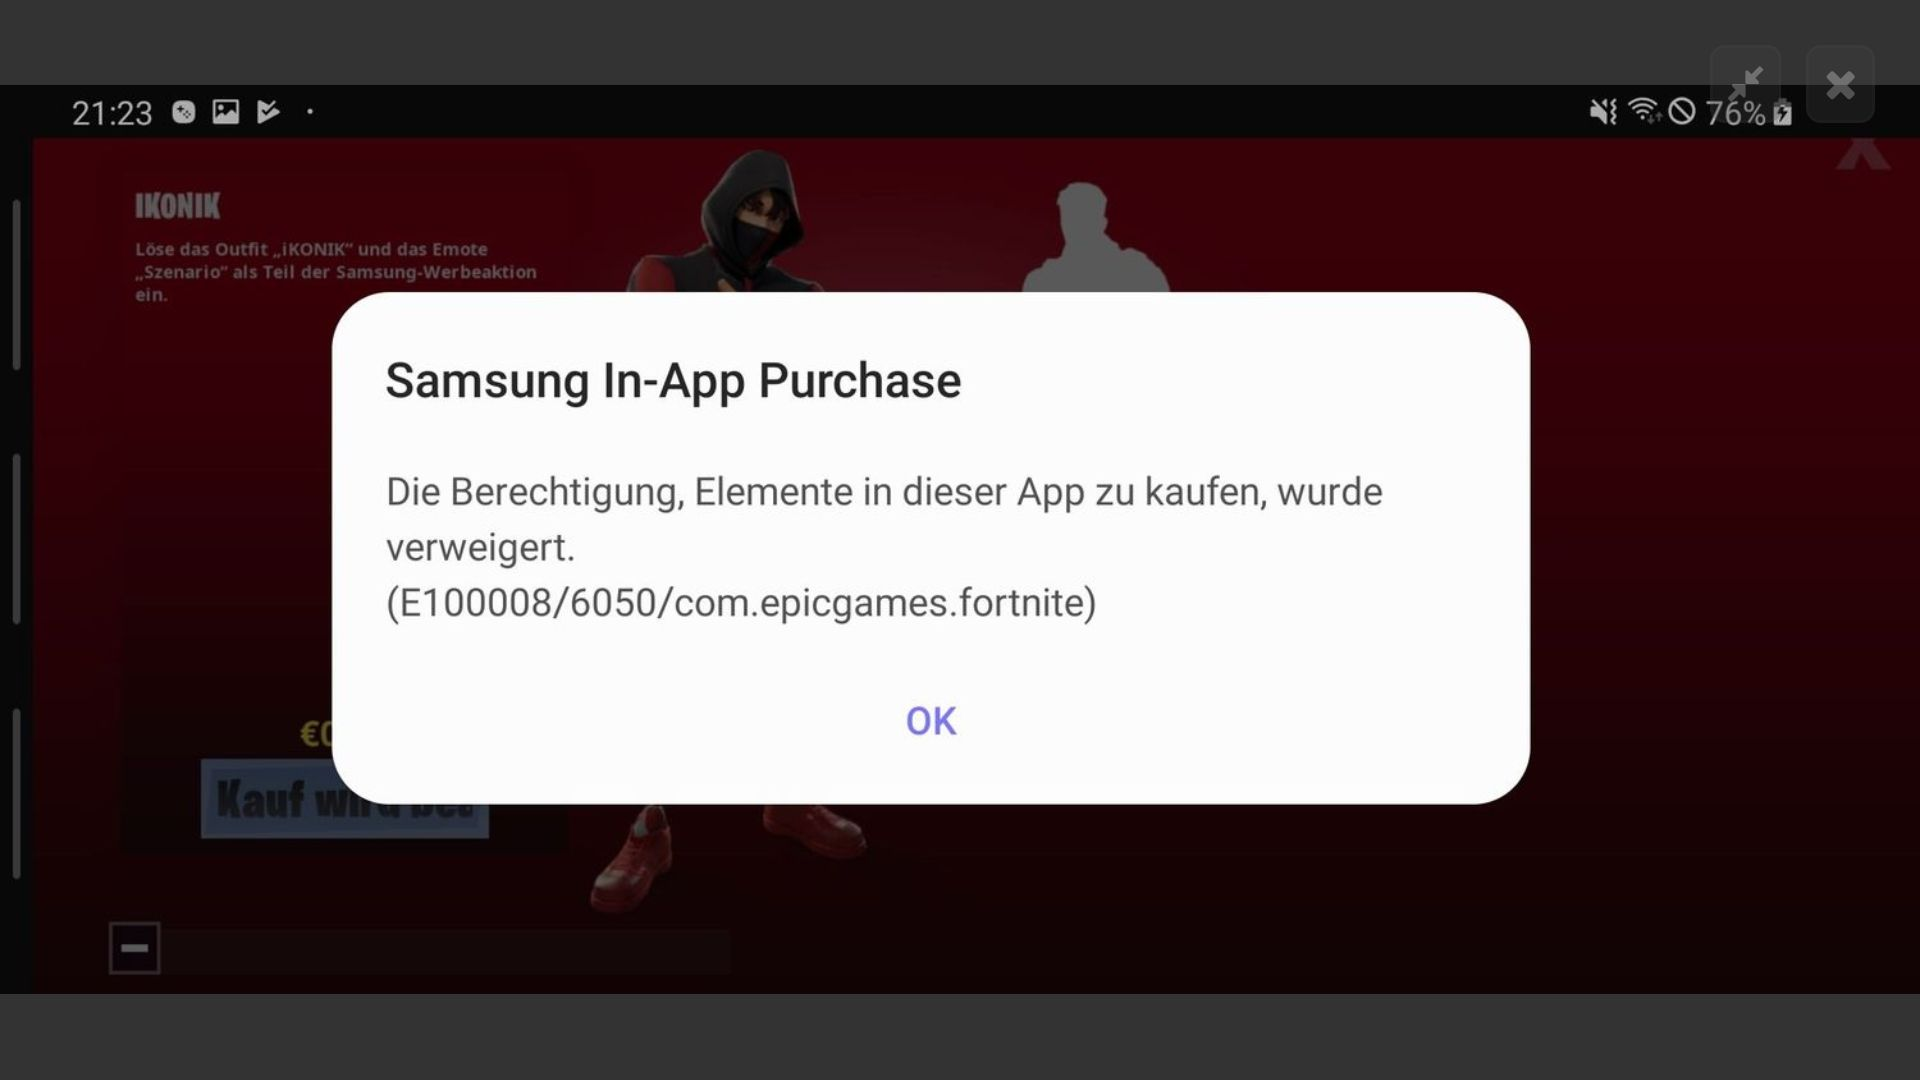 Unknown Error Fortnite Friend Request In App Purchase Denied New Samsung User S10 Ikon S Samsung Community